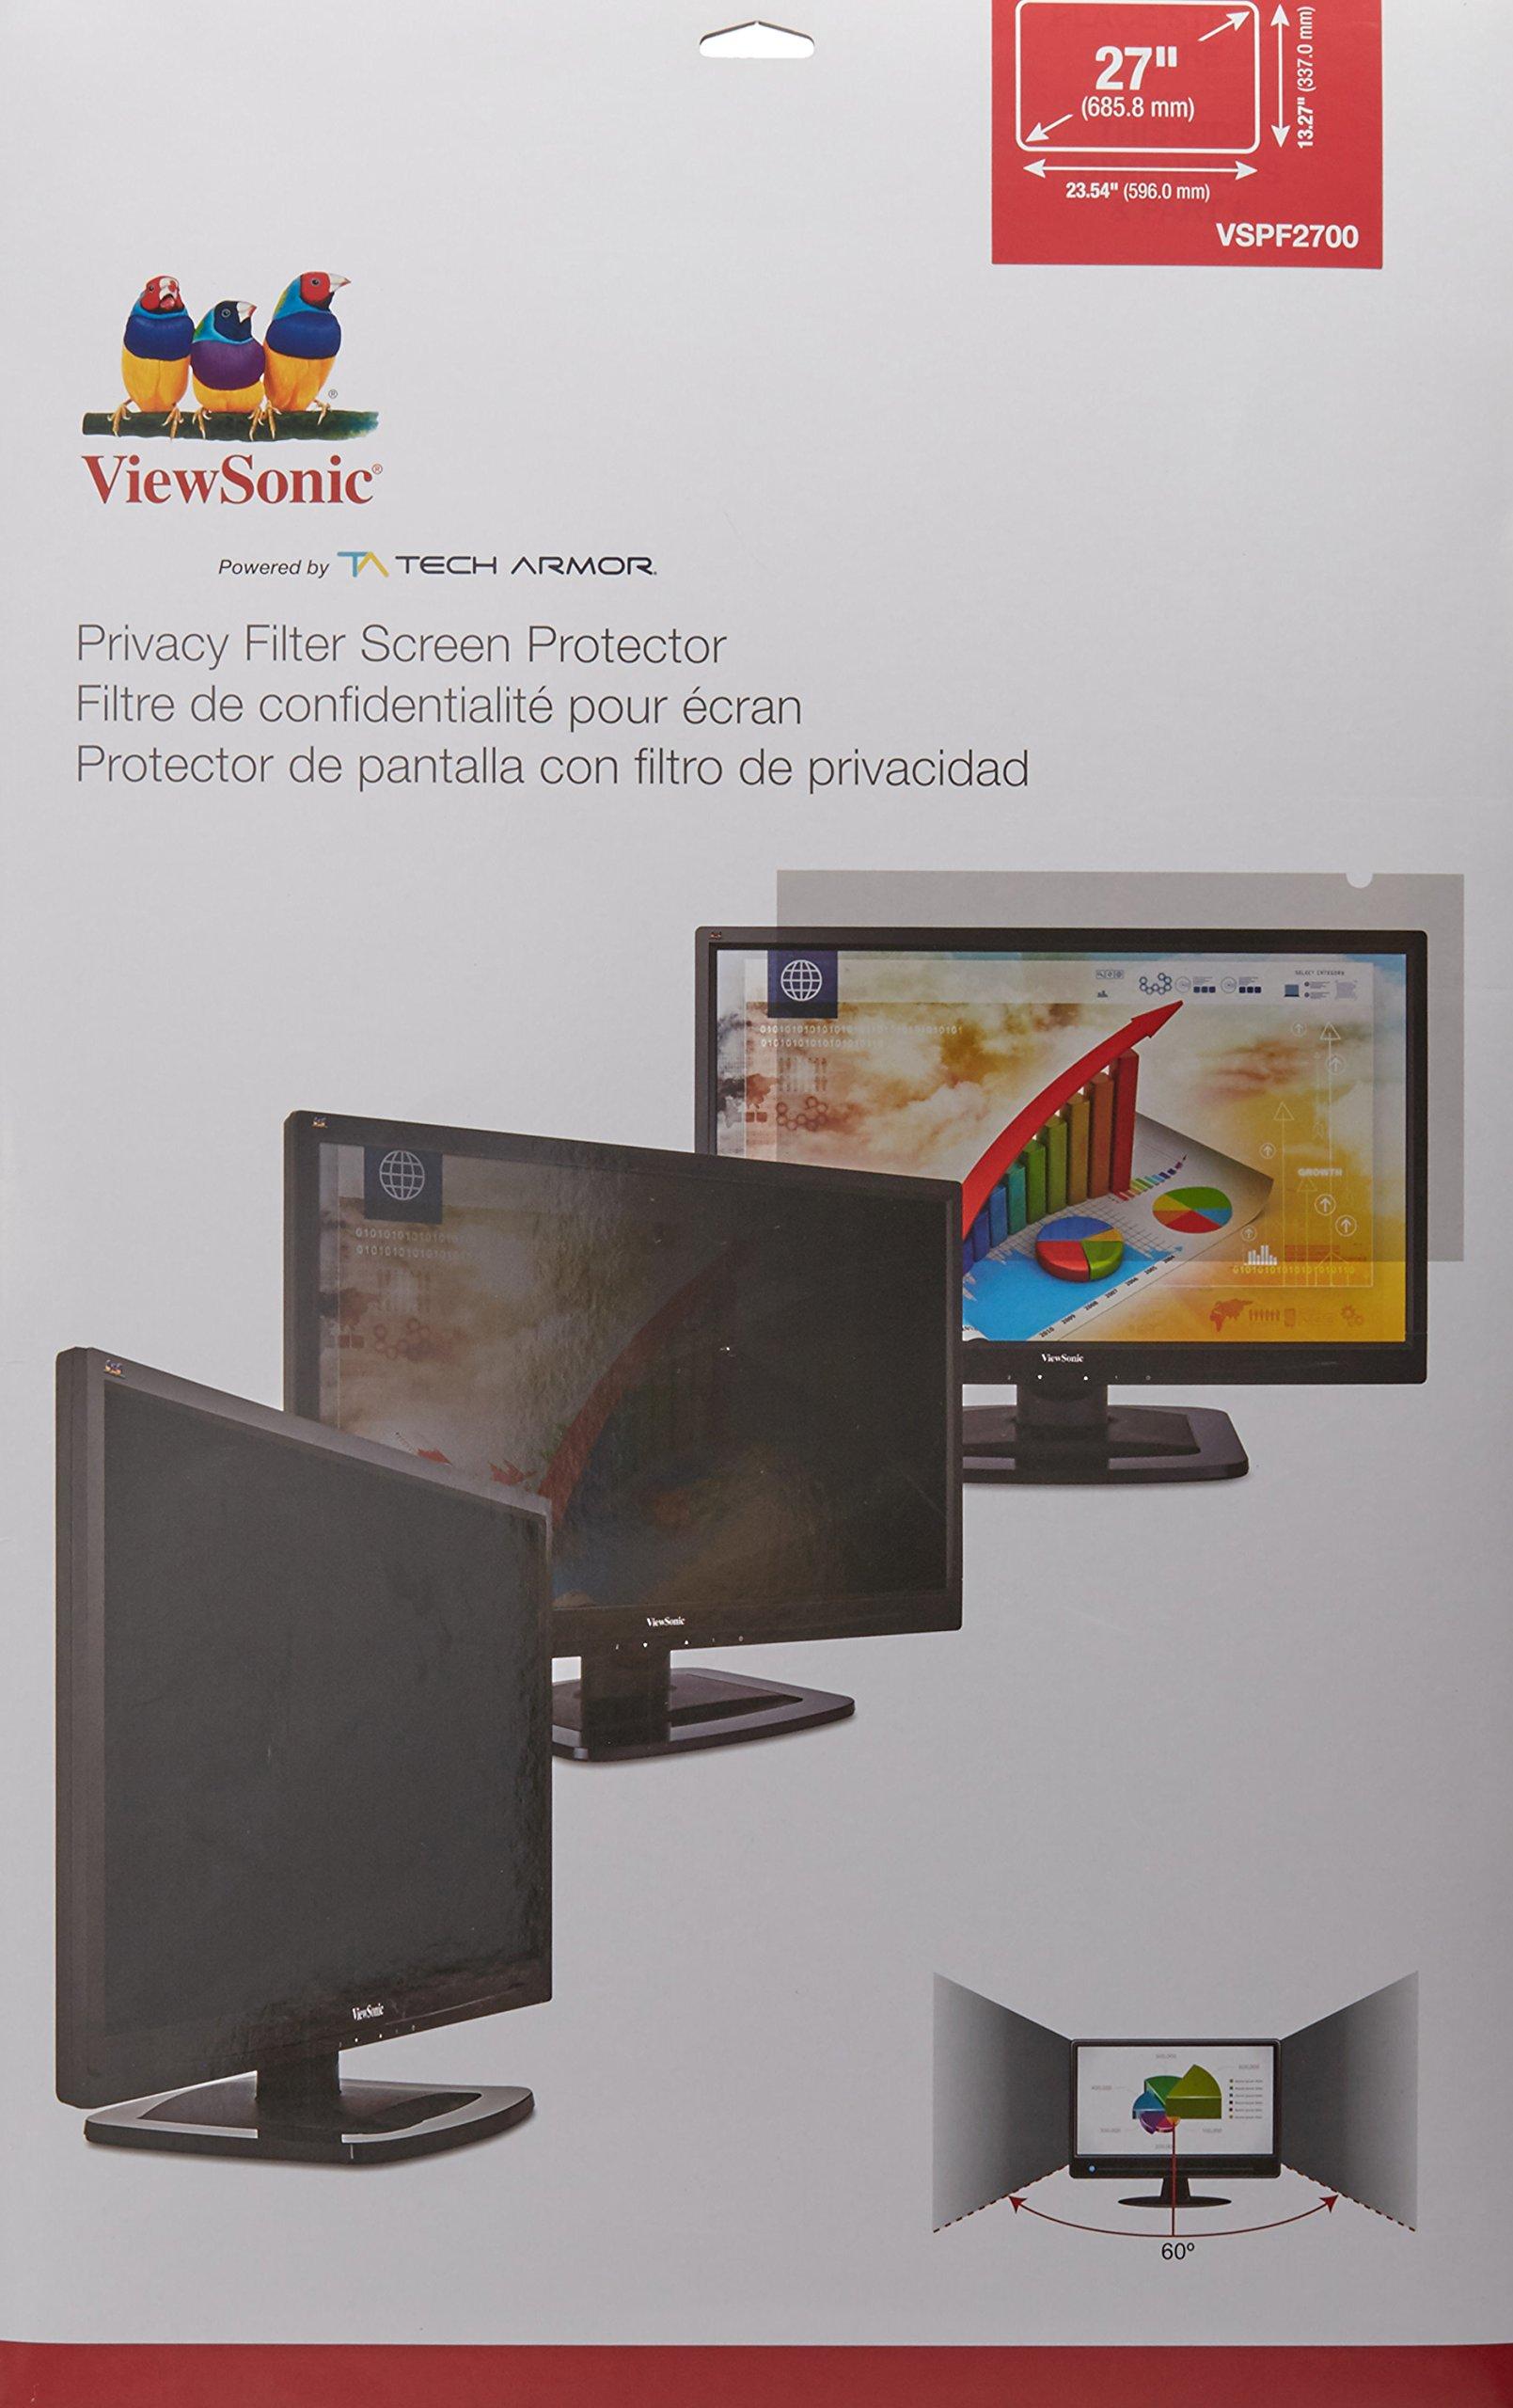 Viewsonic display privacy filter, 27'' wide (VSPF2700)